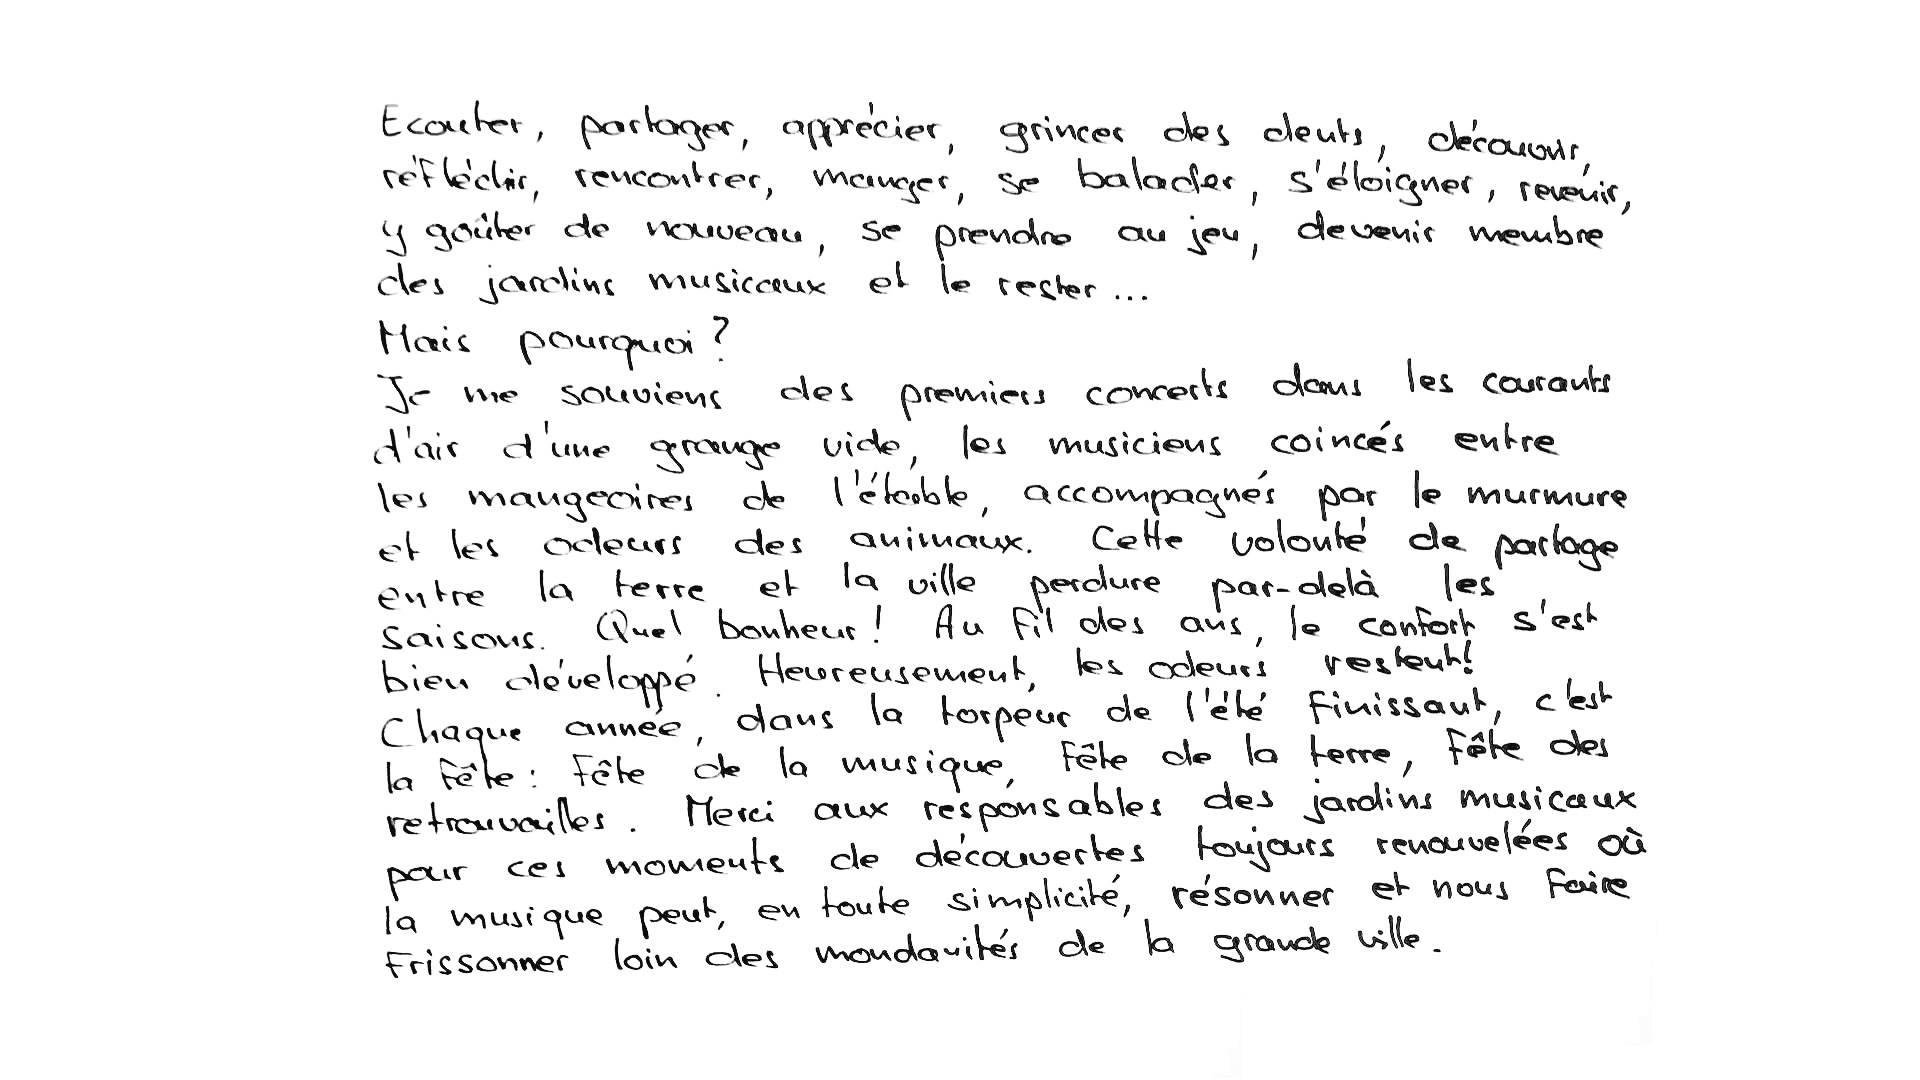 Texte de Jean-Pierre Liechti